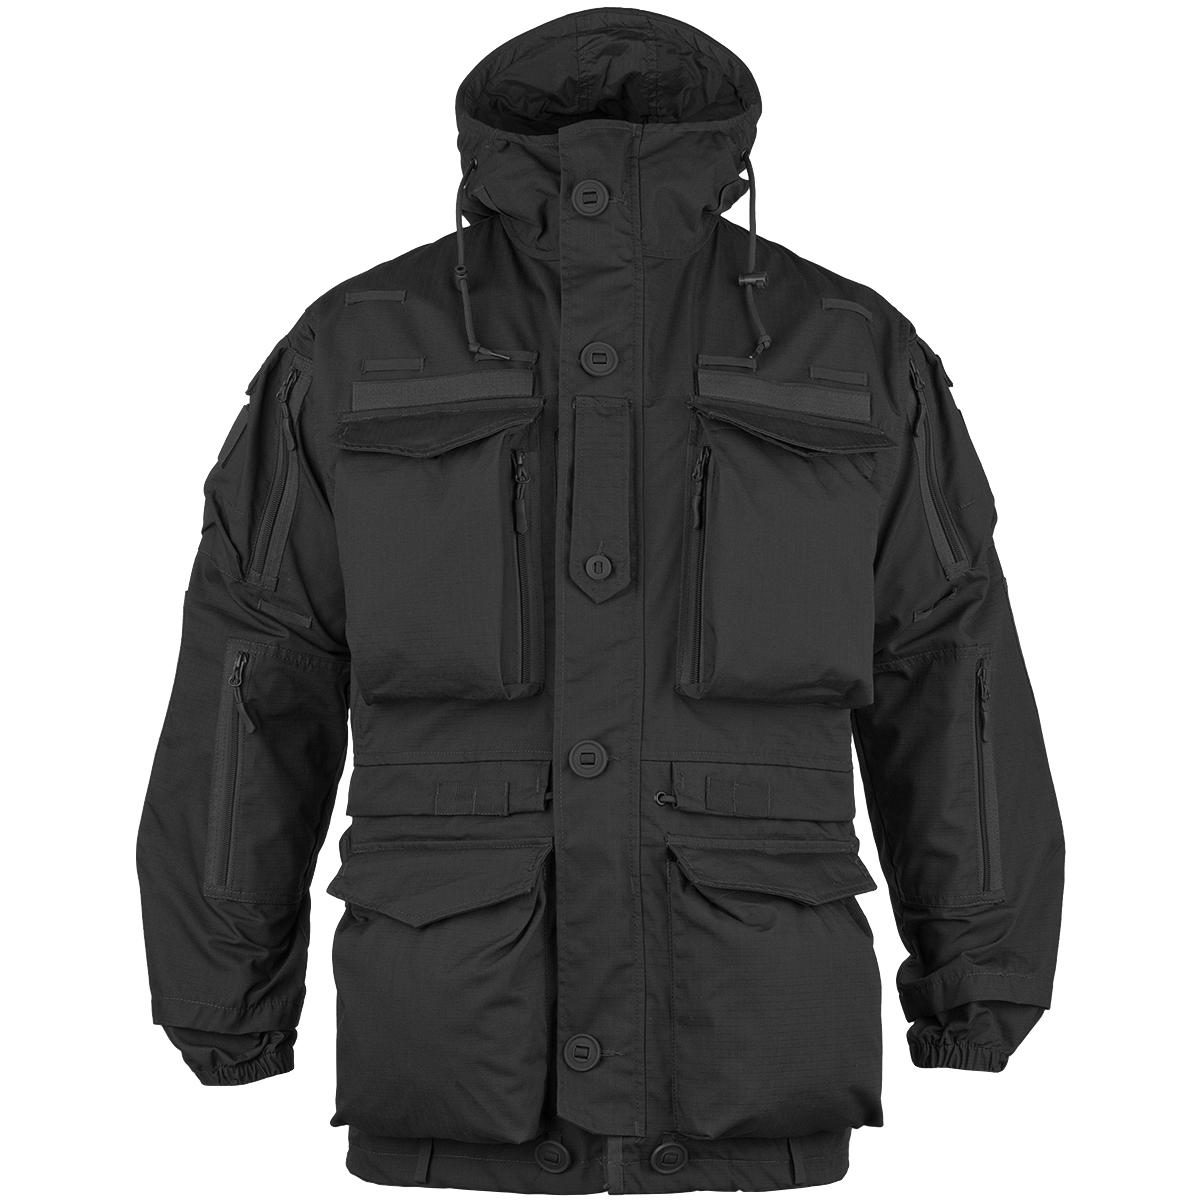 Teesar Tactical Smock Generation II Military Mens Jacket Army Hooded Coat Black | EBay